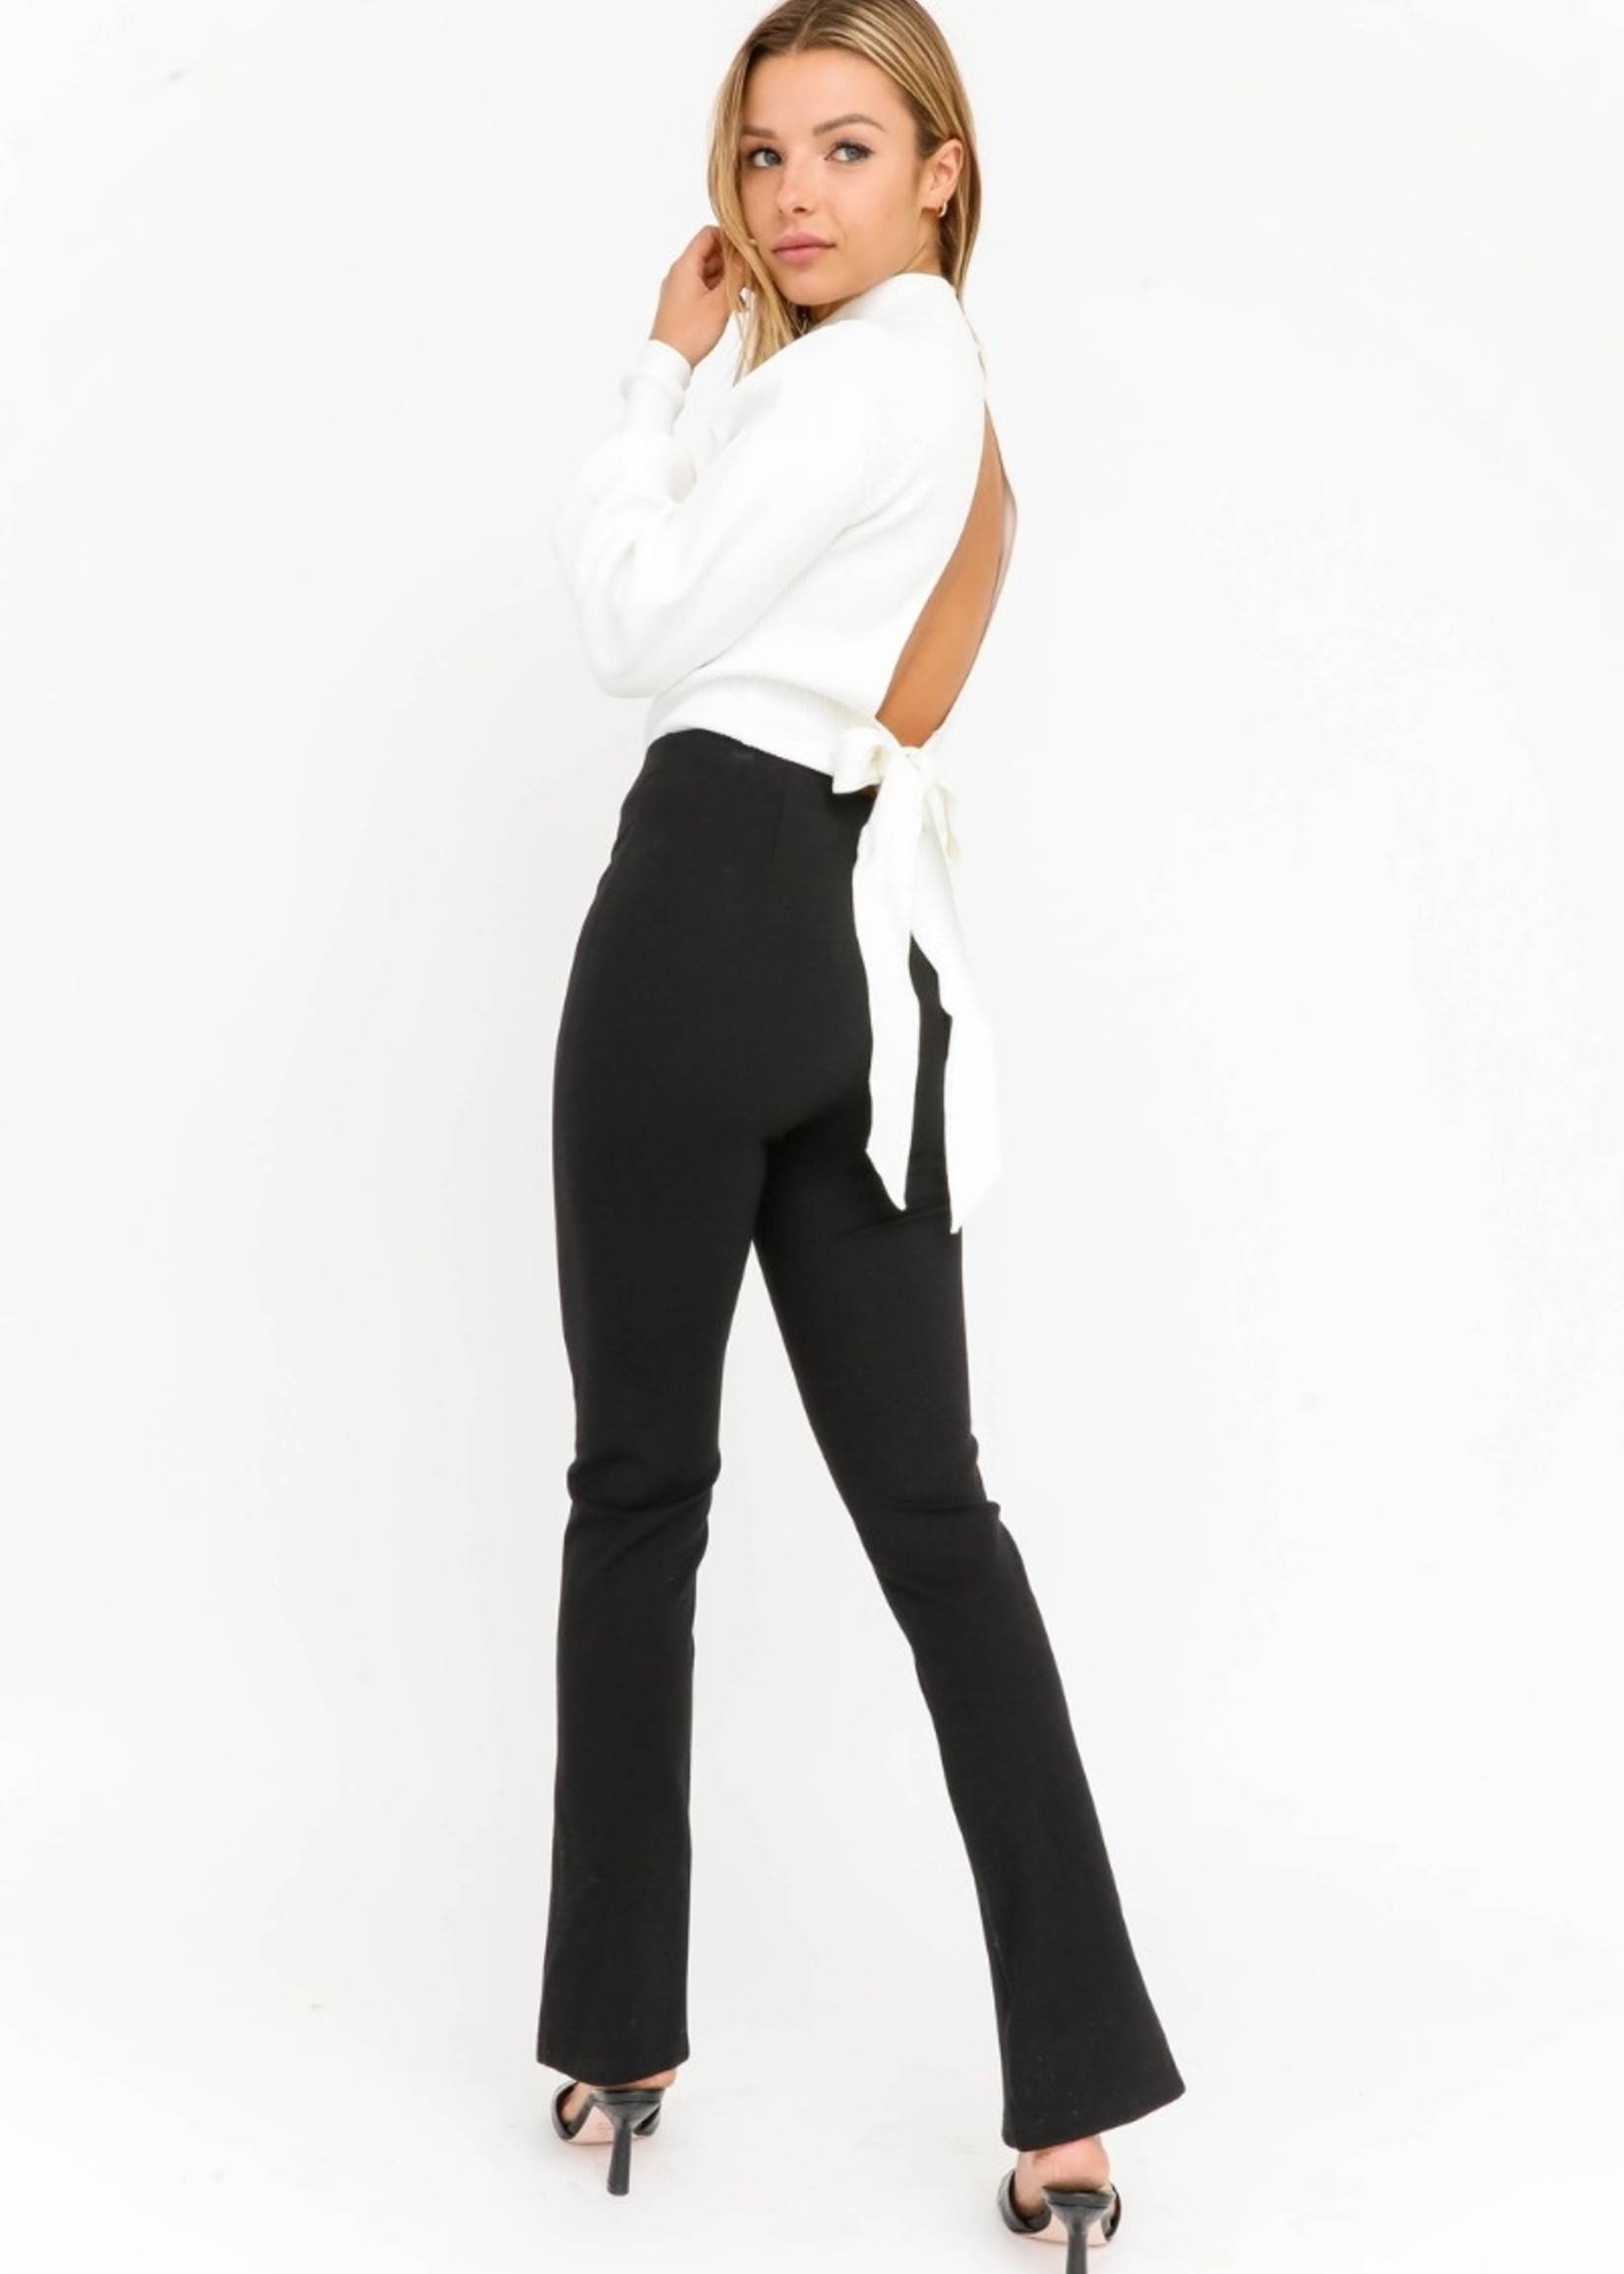 Leg Slit Trousers